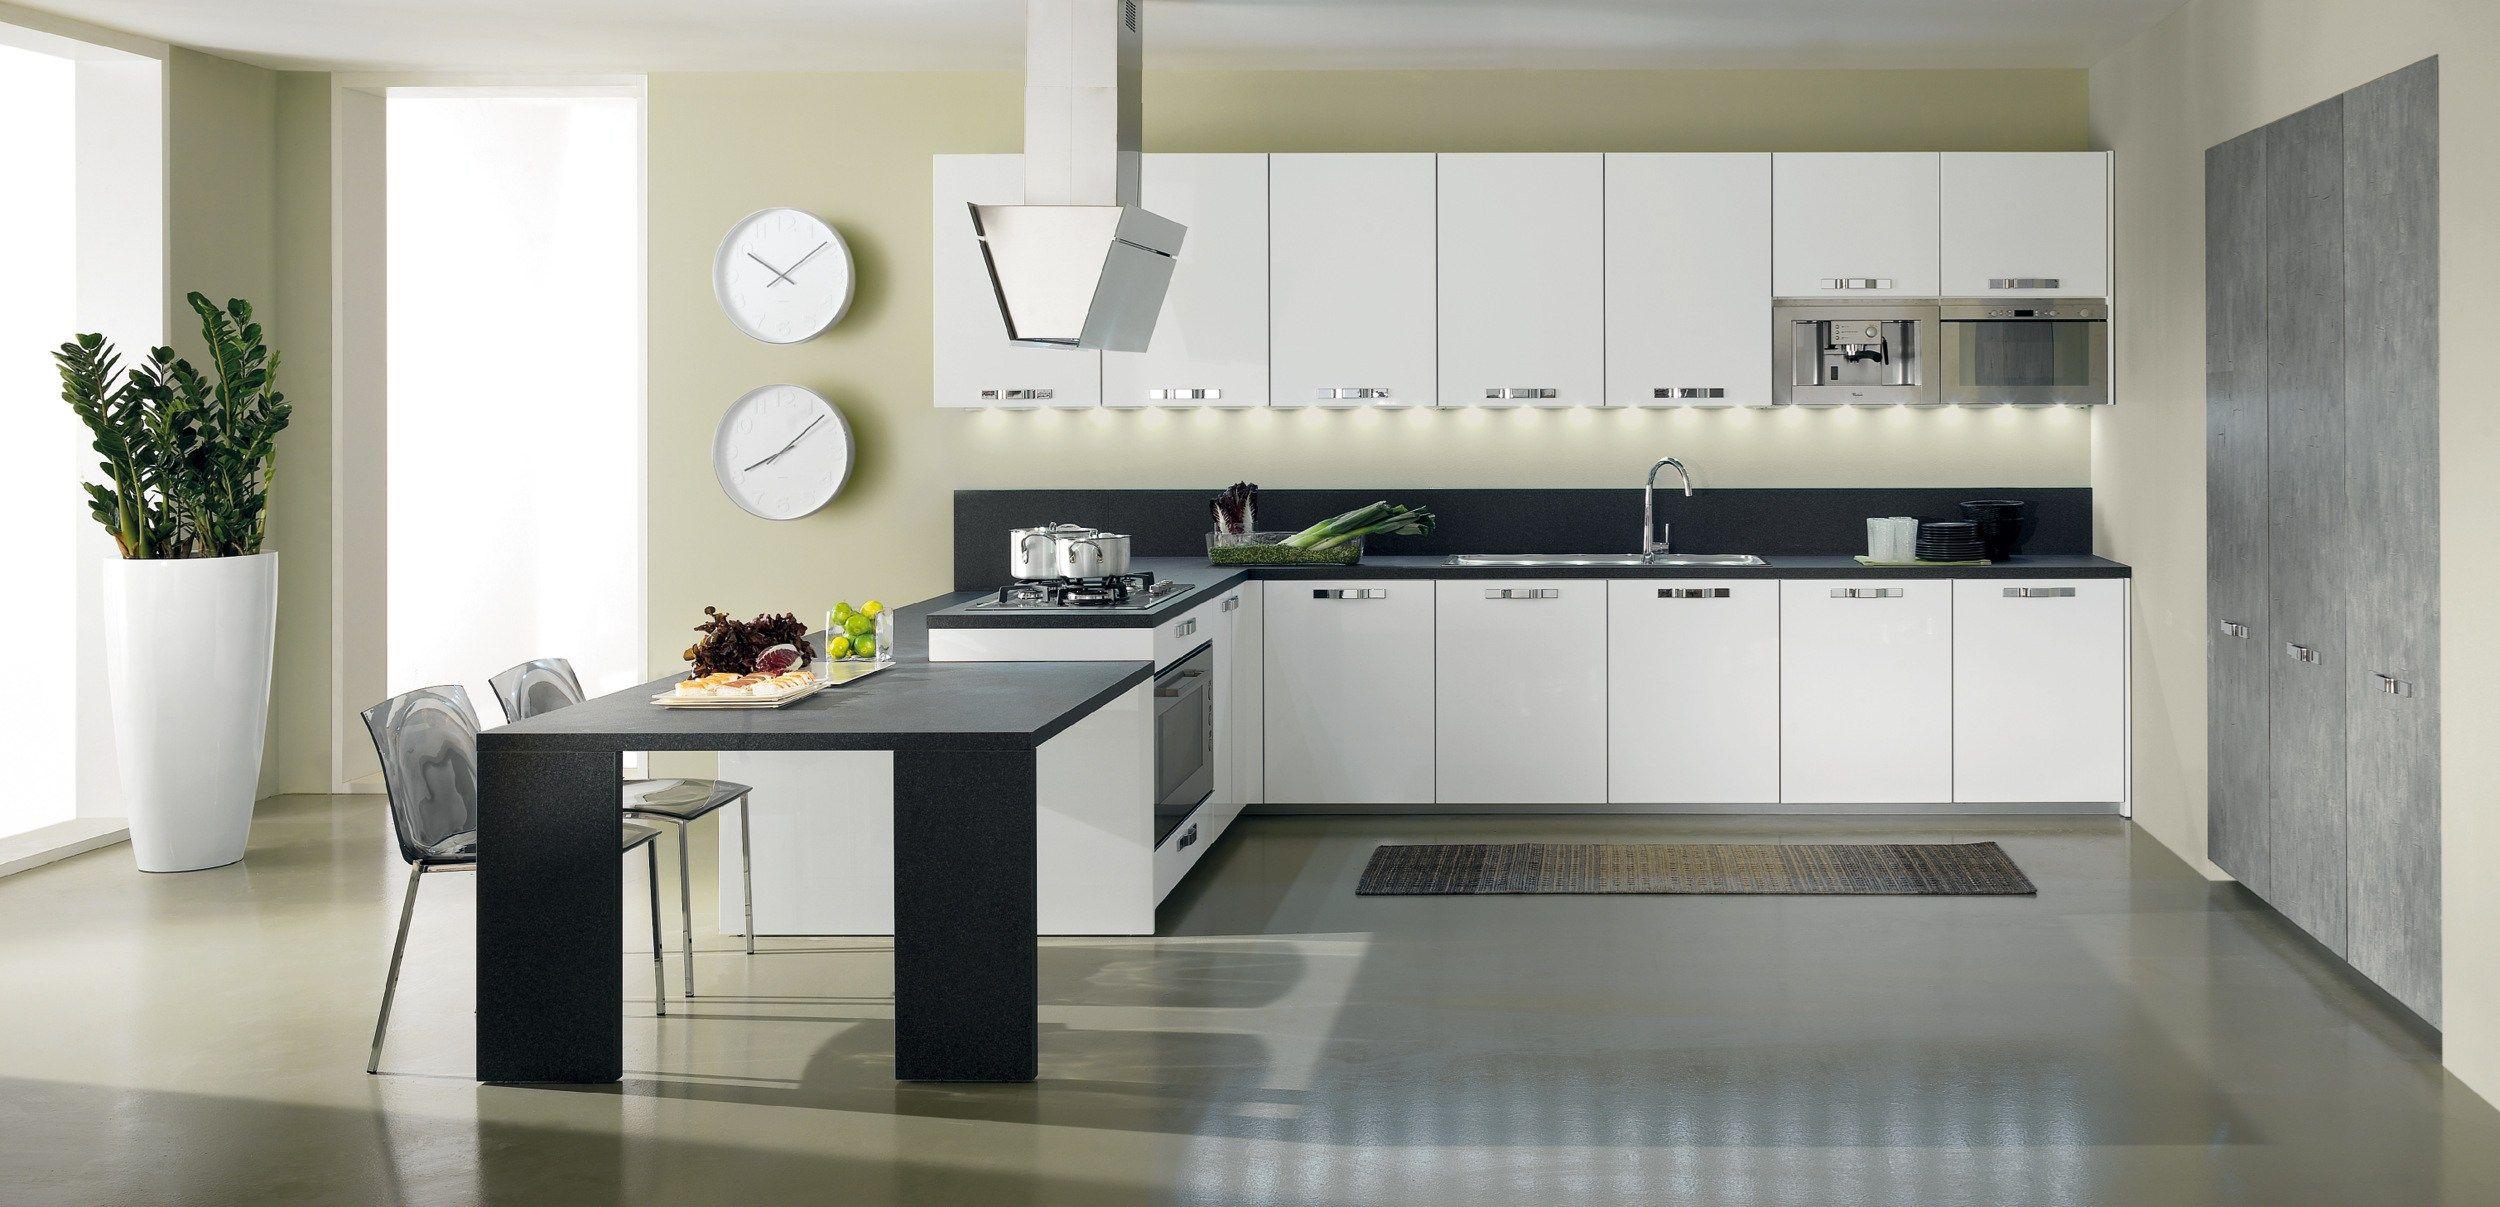 Cucina componibile naxos by del tongo - Cucine del tongo opinioni ...